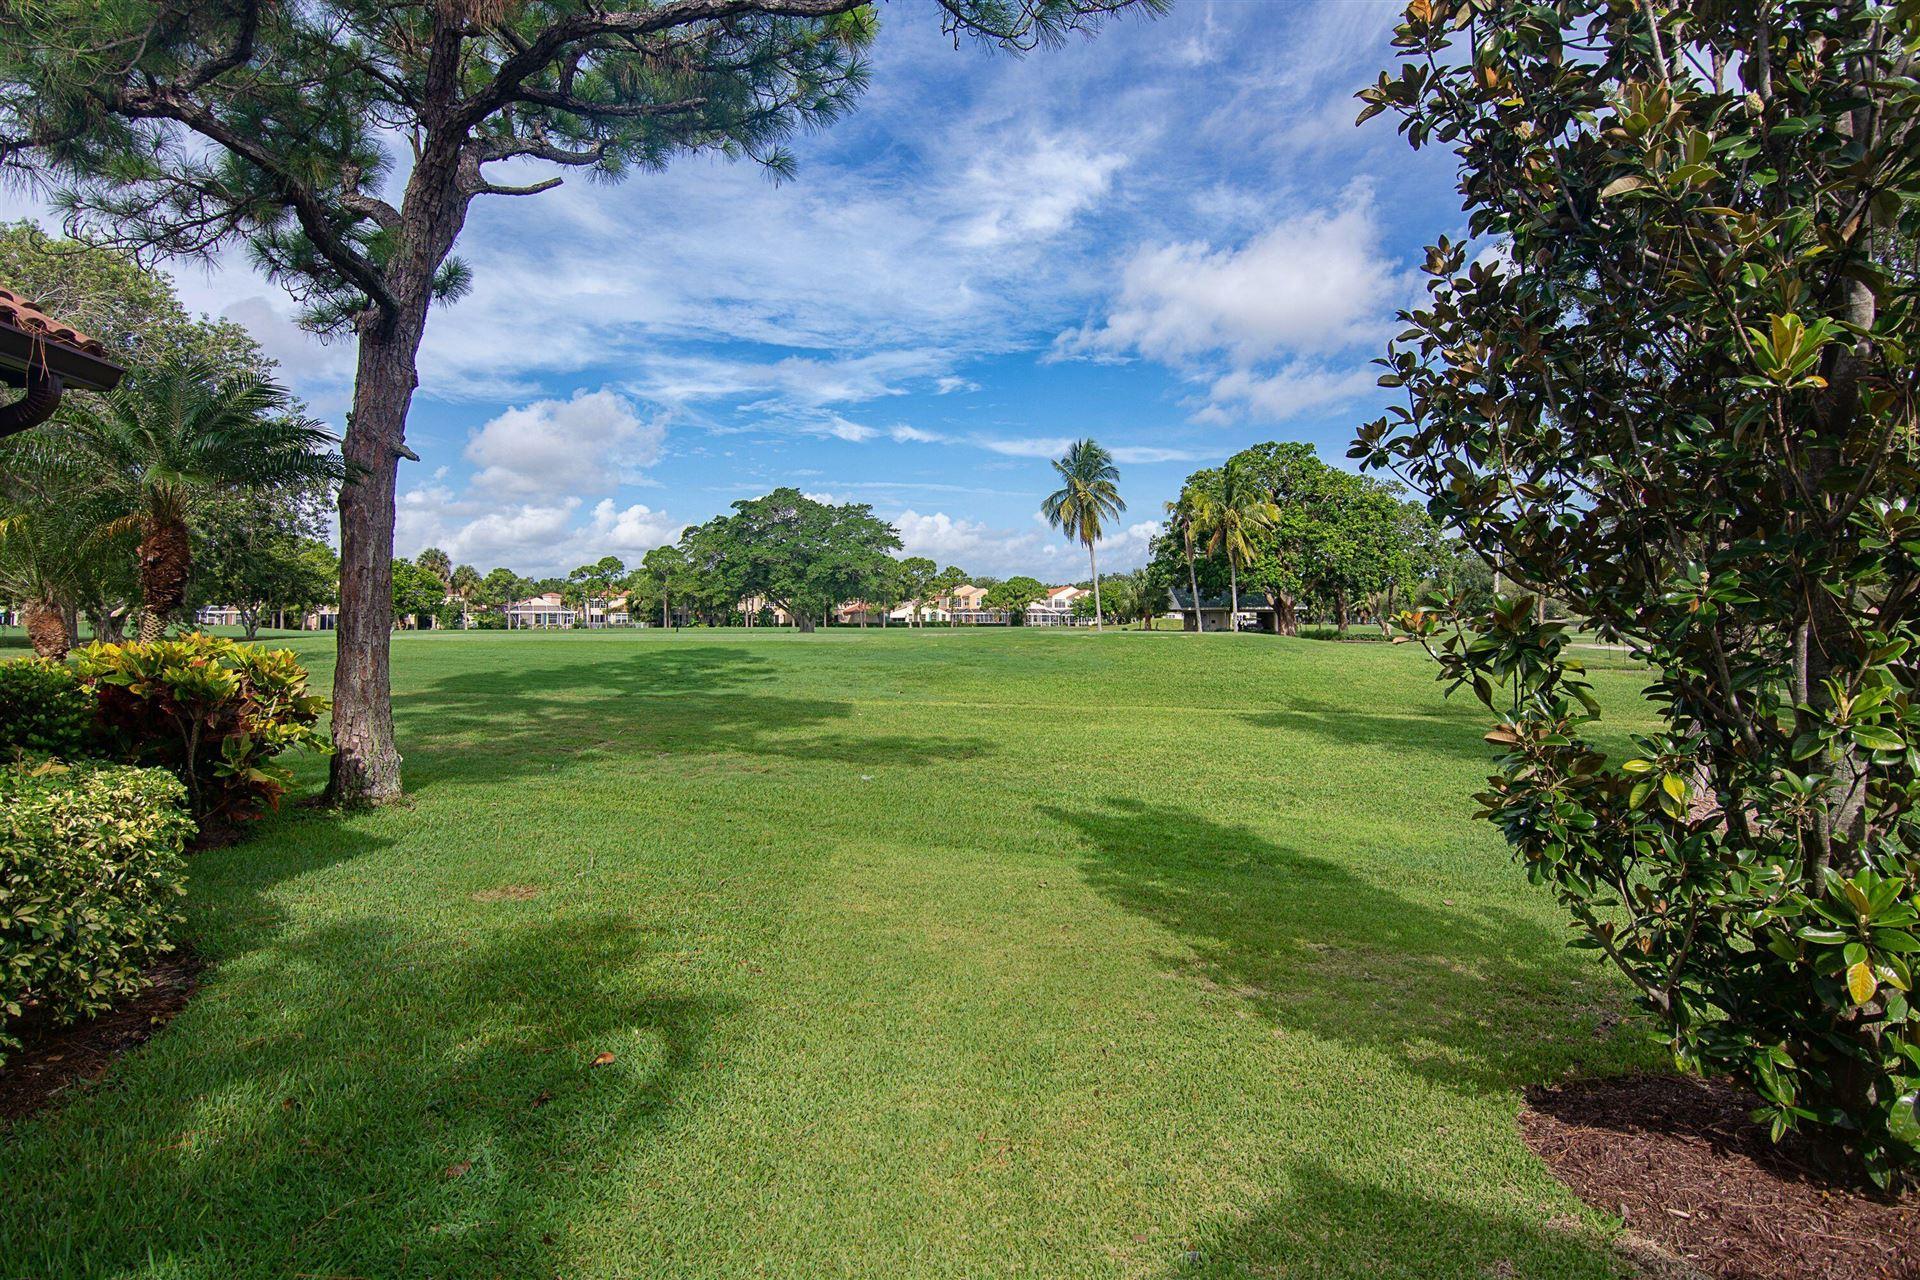 Photo of 19 Ironwood Way N, Palm Beach Gardens, FL 33418 (MLS # RX-10740290)